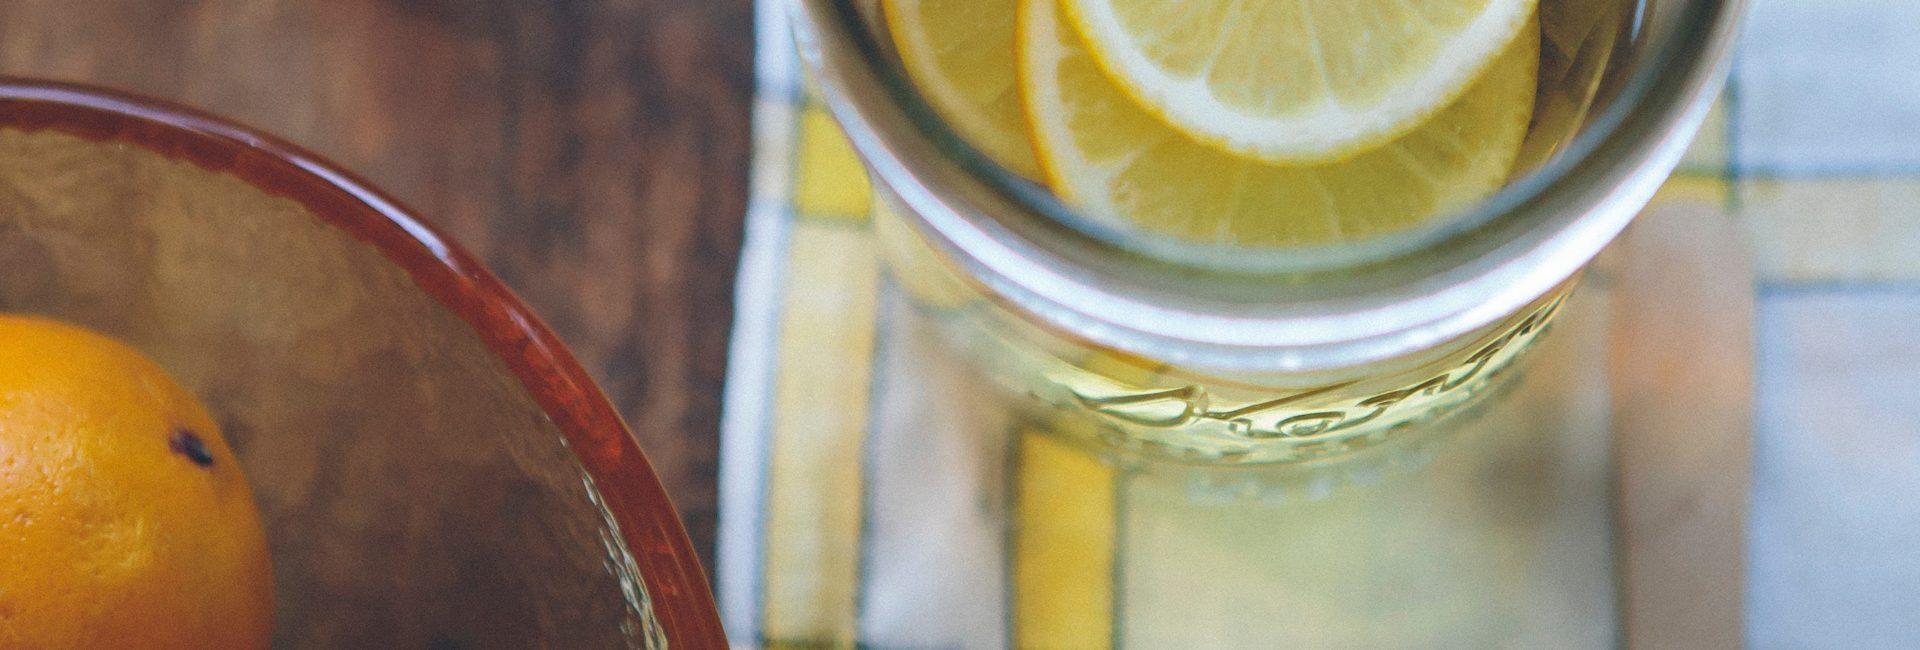 C-vitaminer mot dårlig sædkvalitet